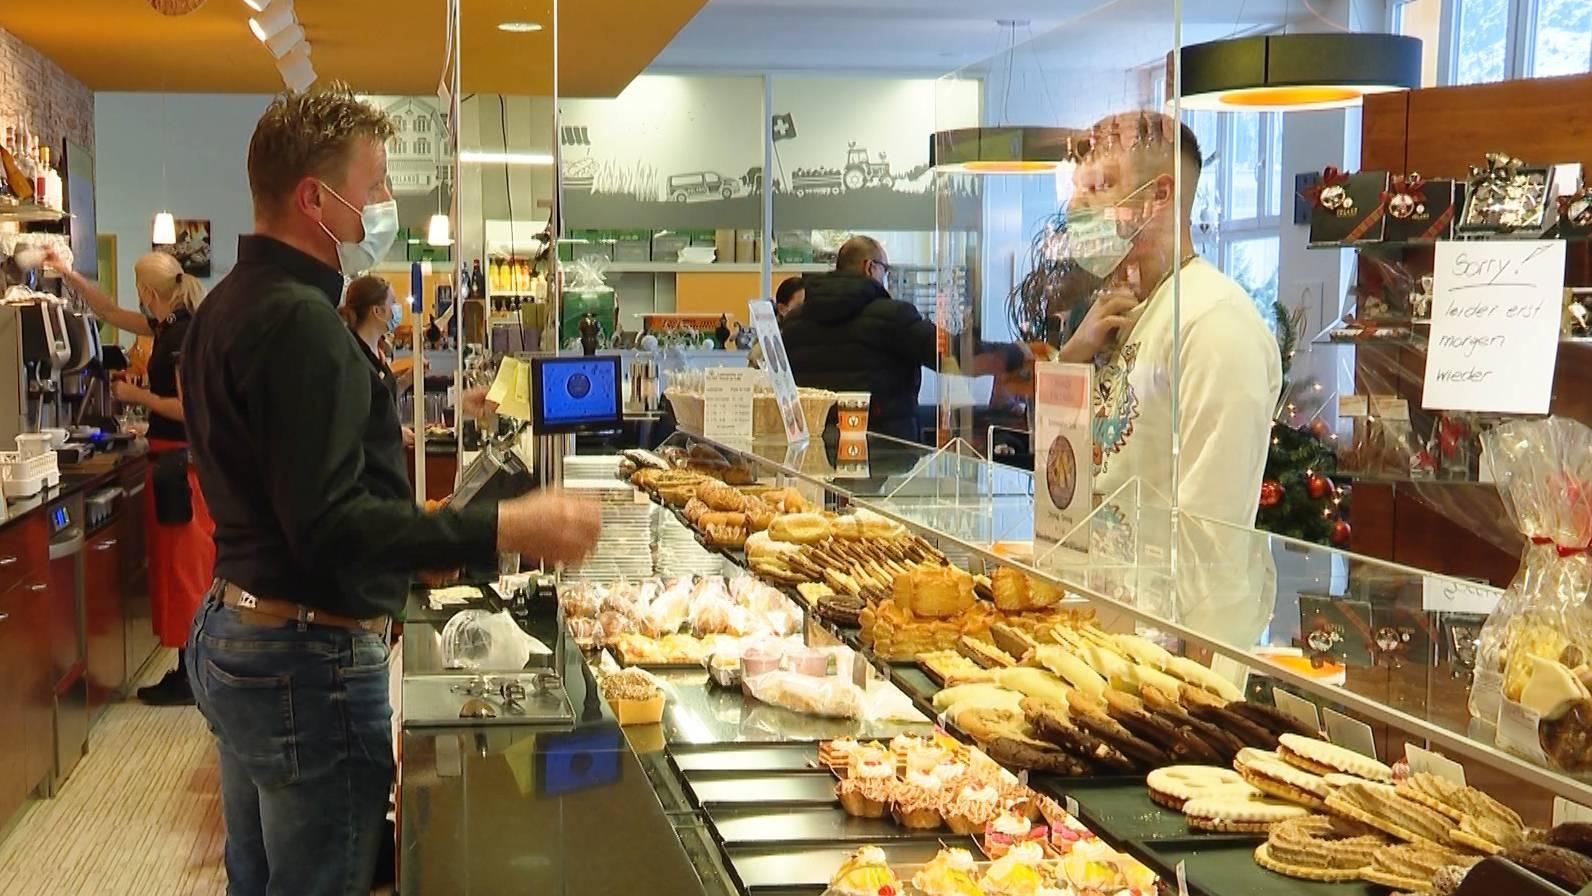 Thumb for ‹Polizei schliesst Bäckerei wegen neuen Corona-Regeln›